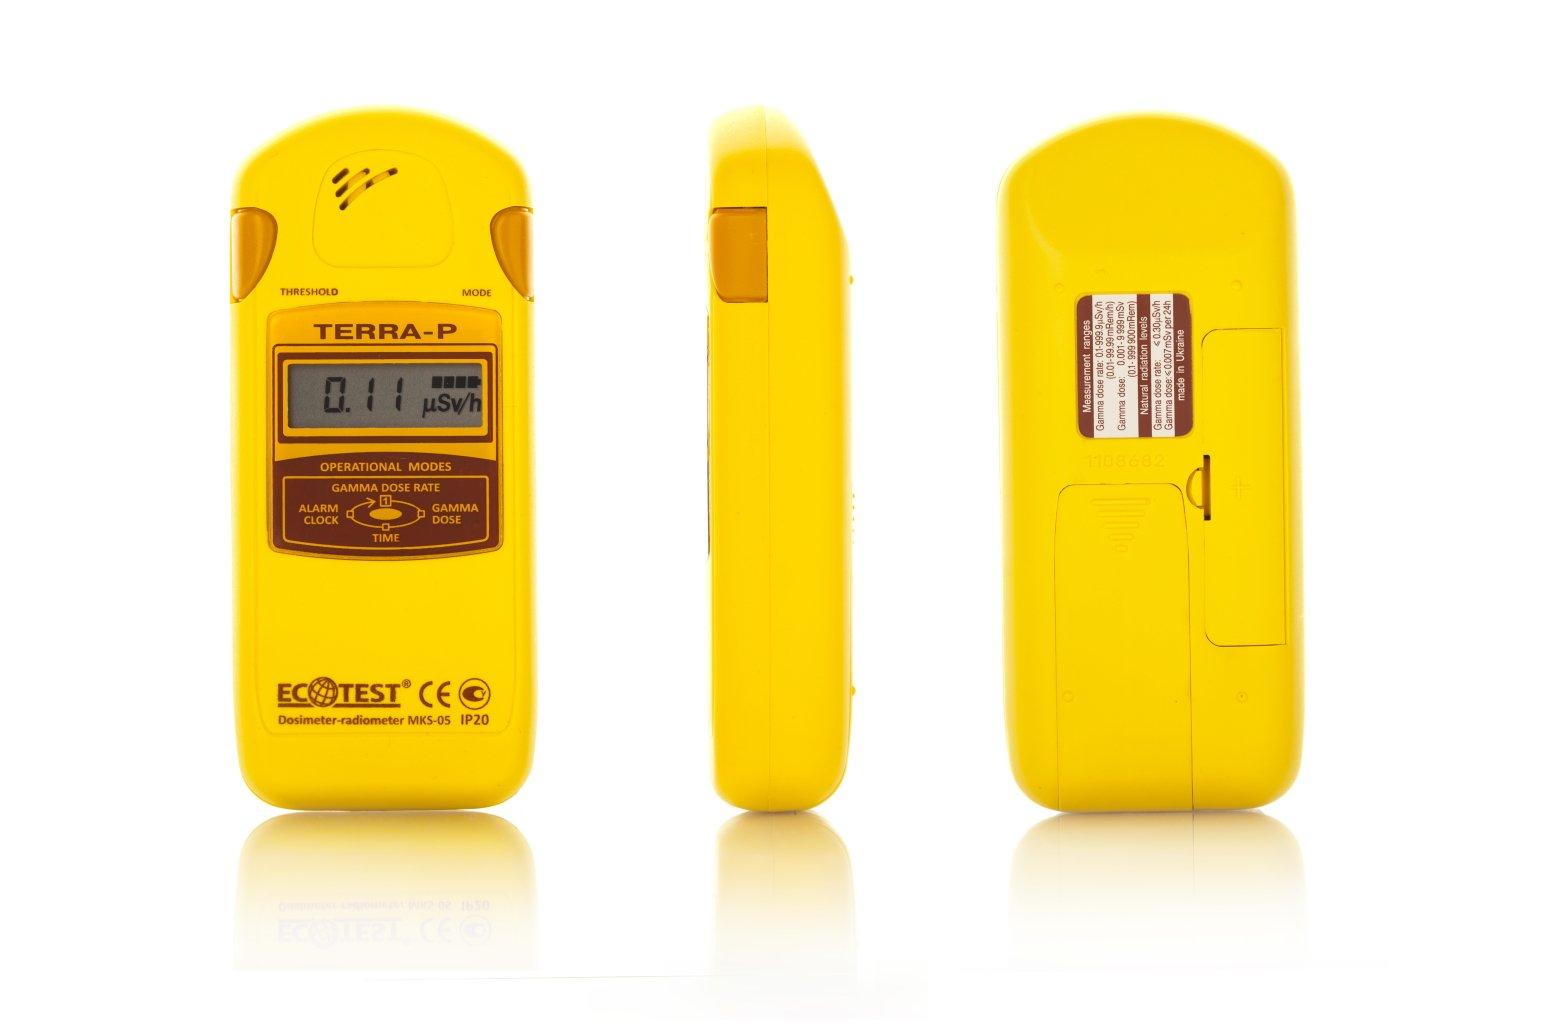 Geiger Counter Terra-P, Dosimeter Radiometer Radiation Detector MKS-05 IP30